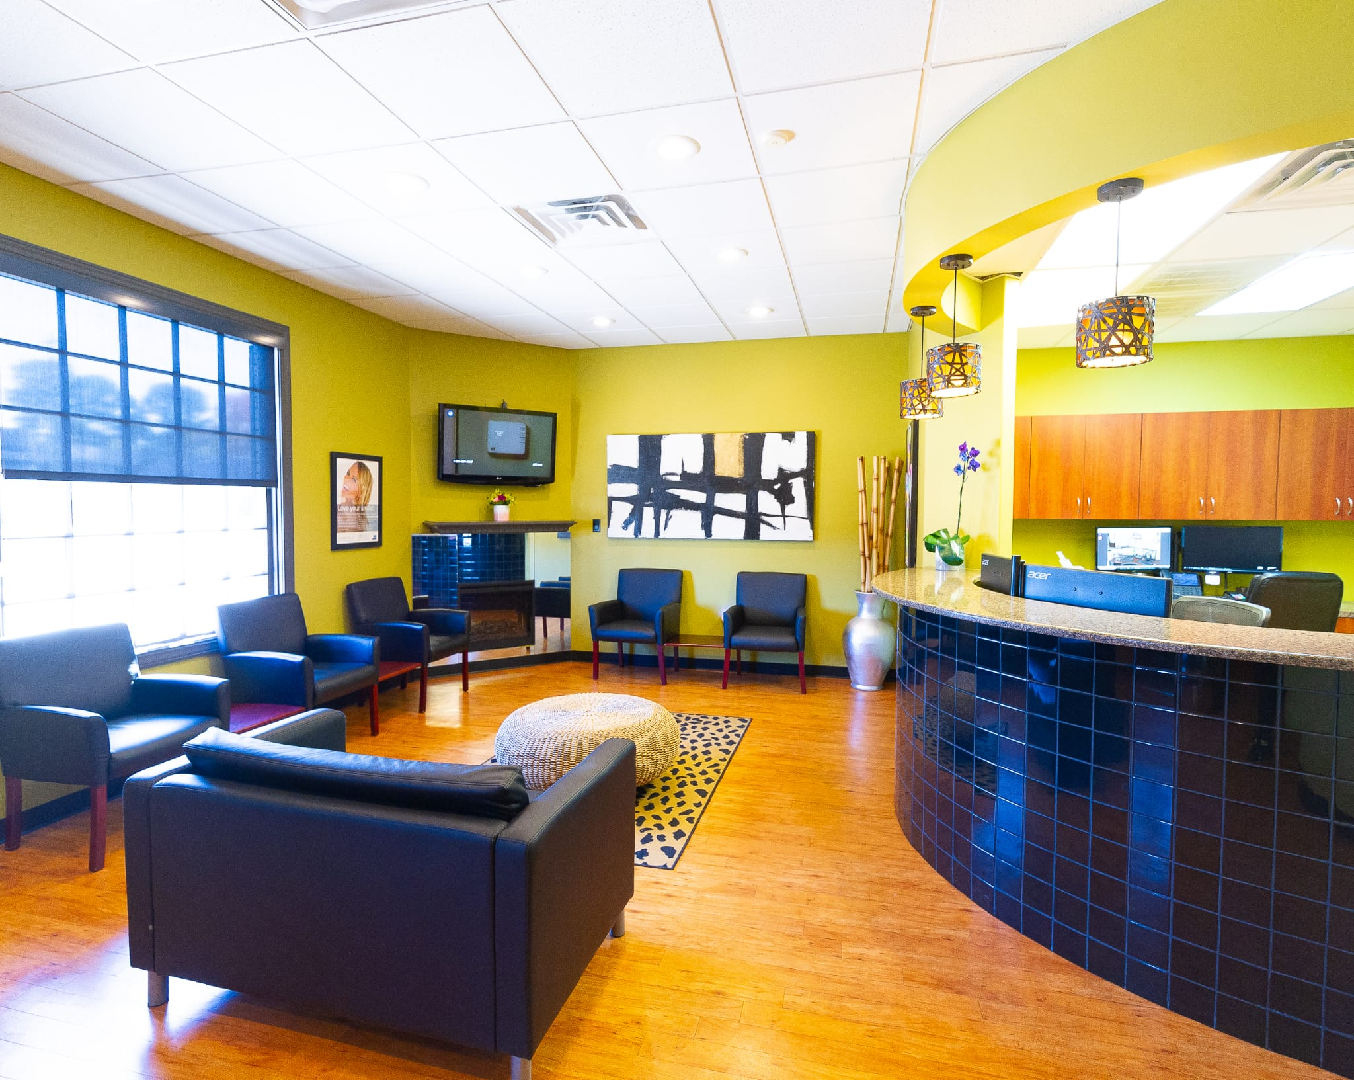 Office Interior Gairhan Dental Care 2020 Jonesboro AR Dentist 4 - We Love Jonesboro